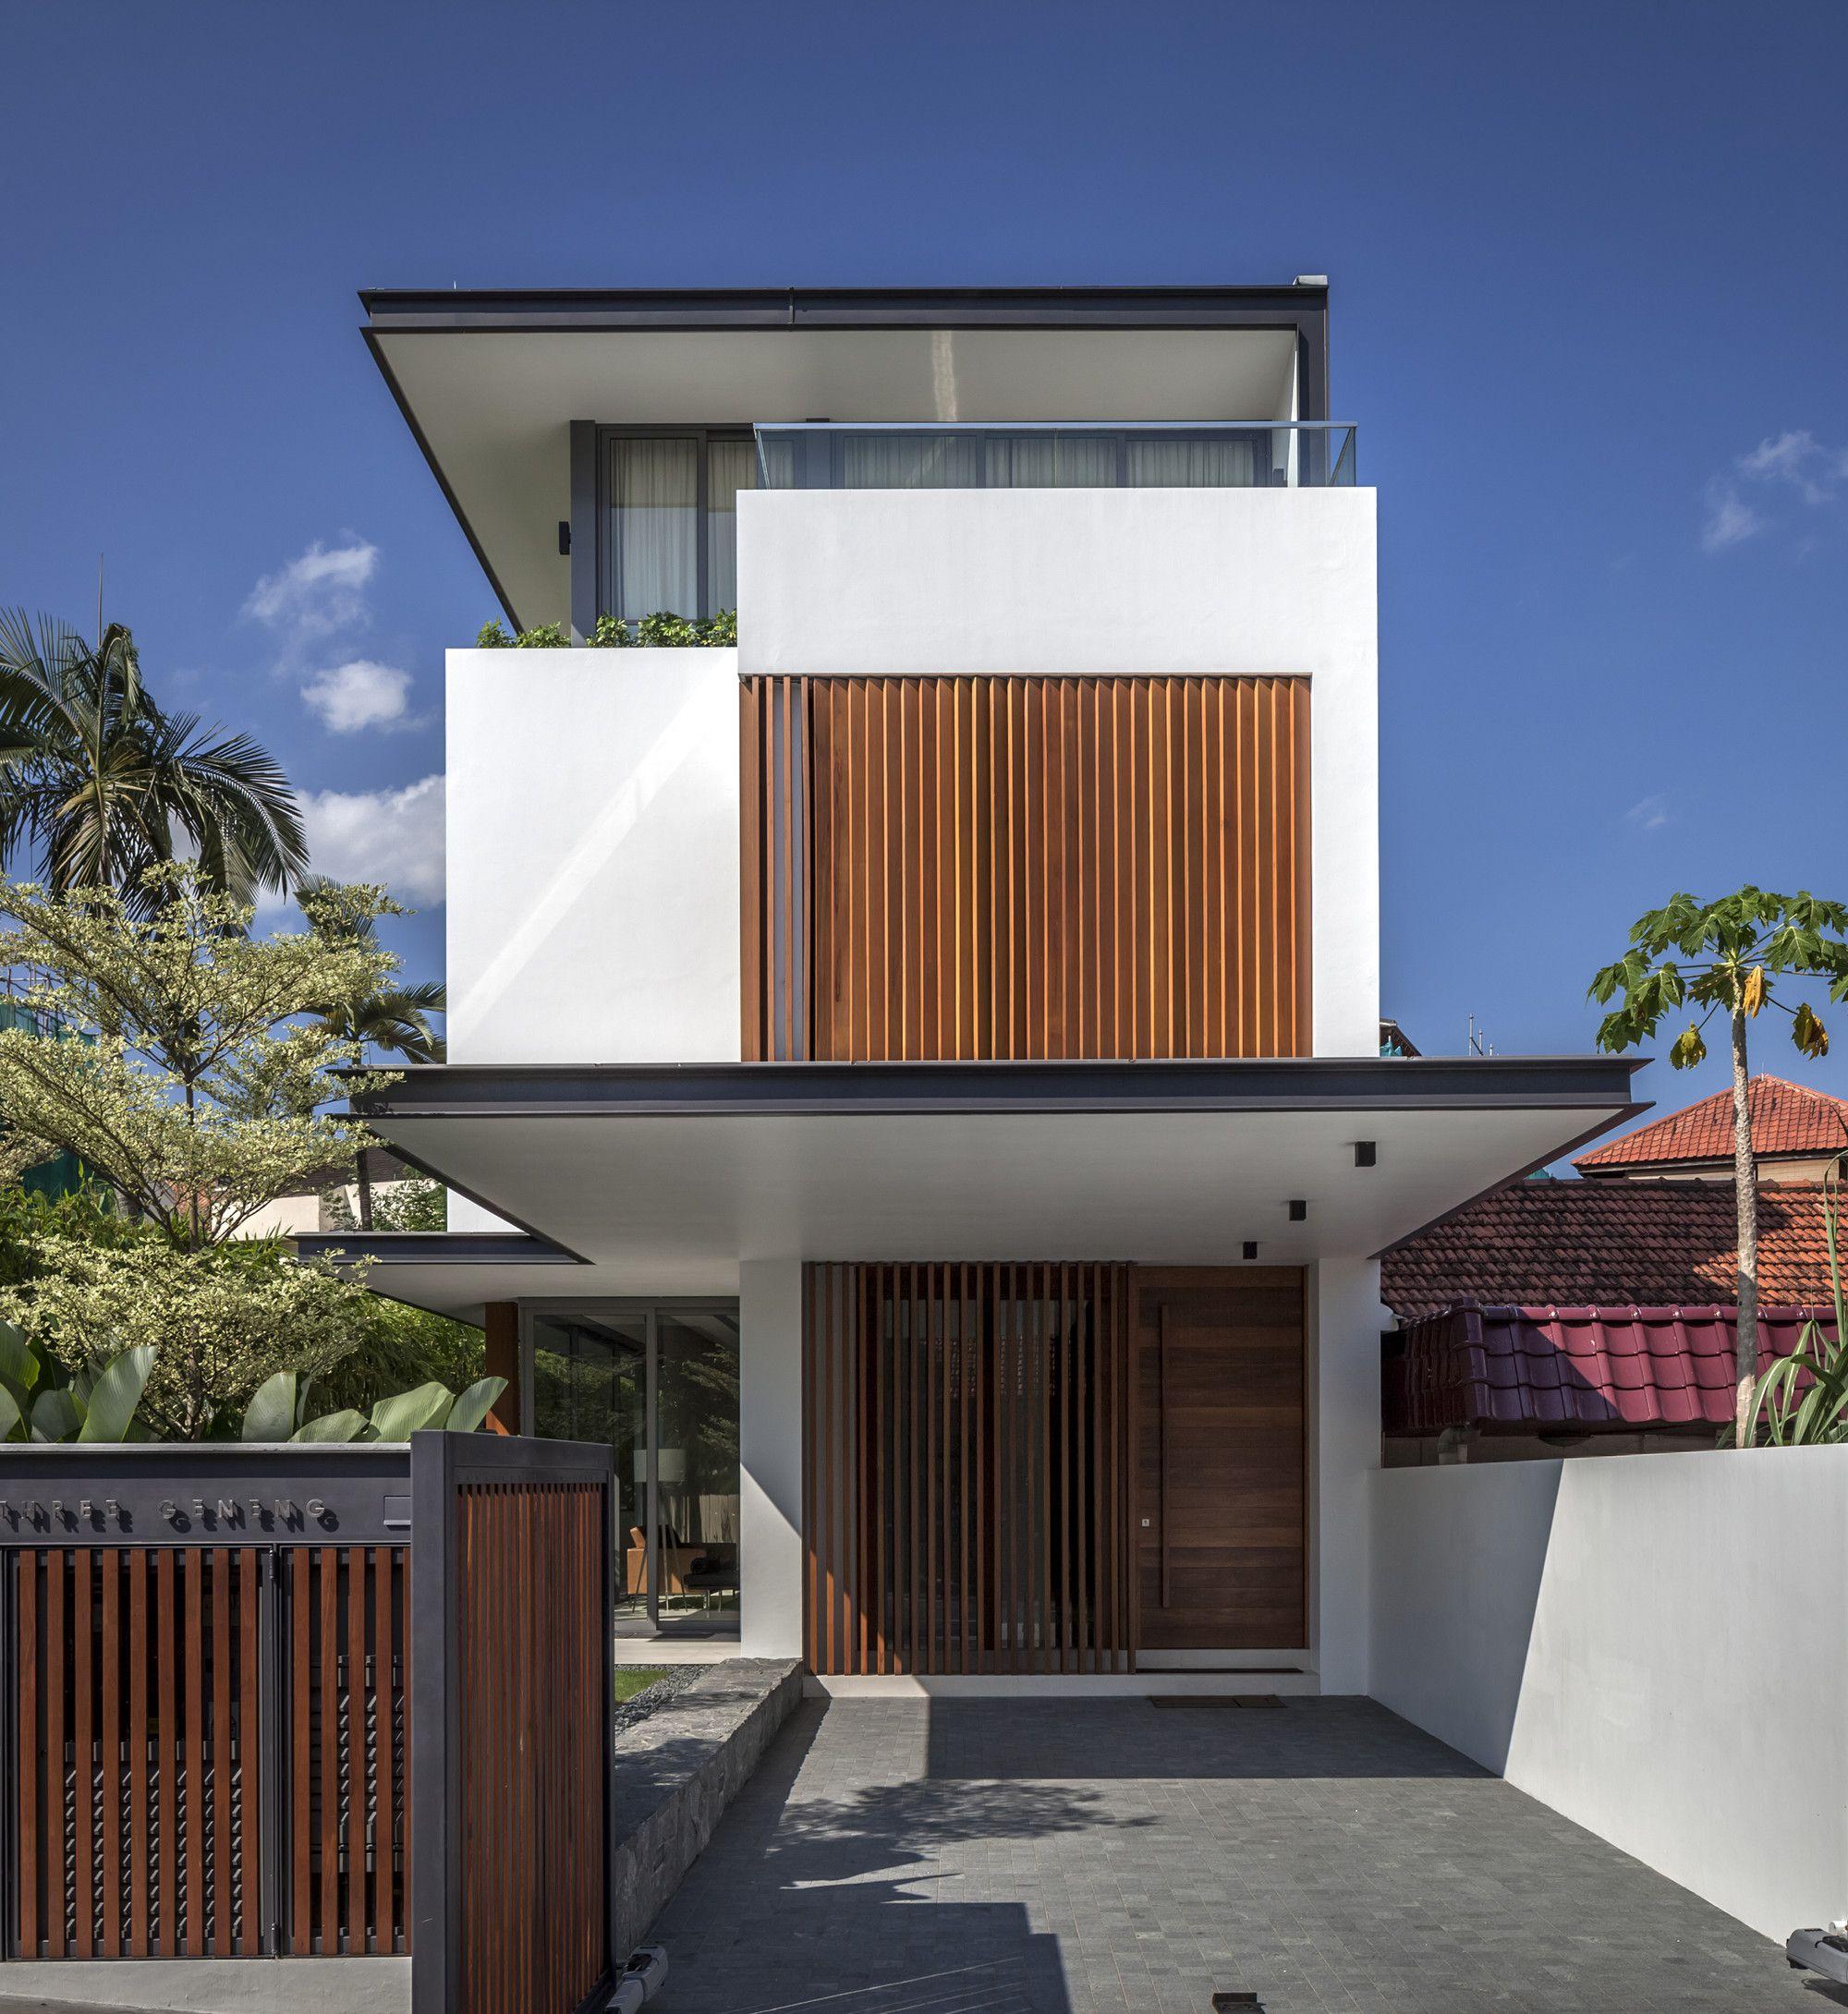 Tremendous 1000 Images About Architecture On Pinterest House Villas And Largest Home Design Picture Inspirations Pitcheantrous